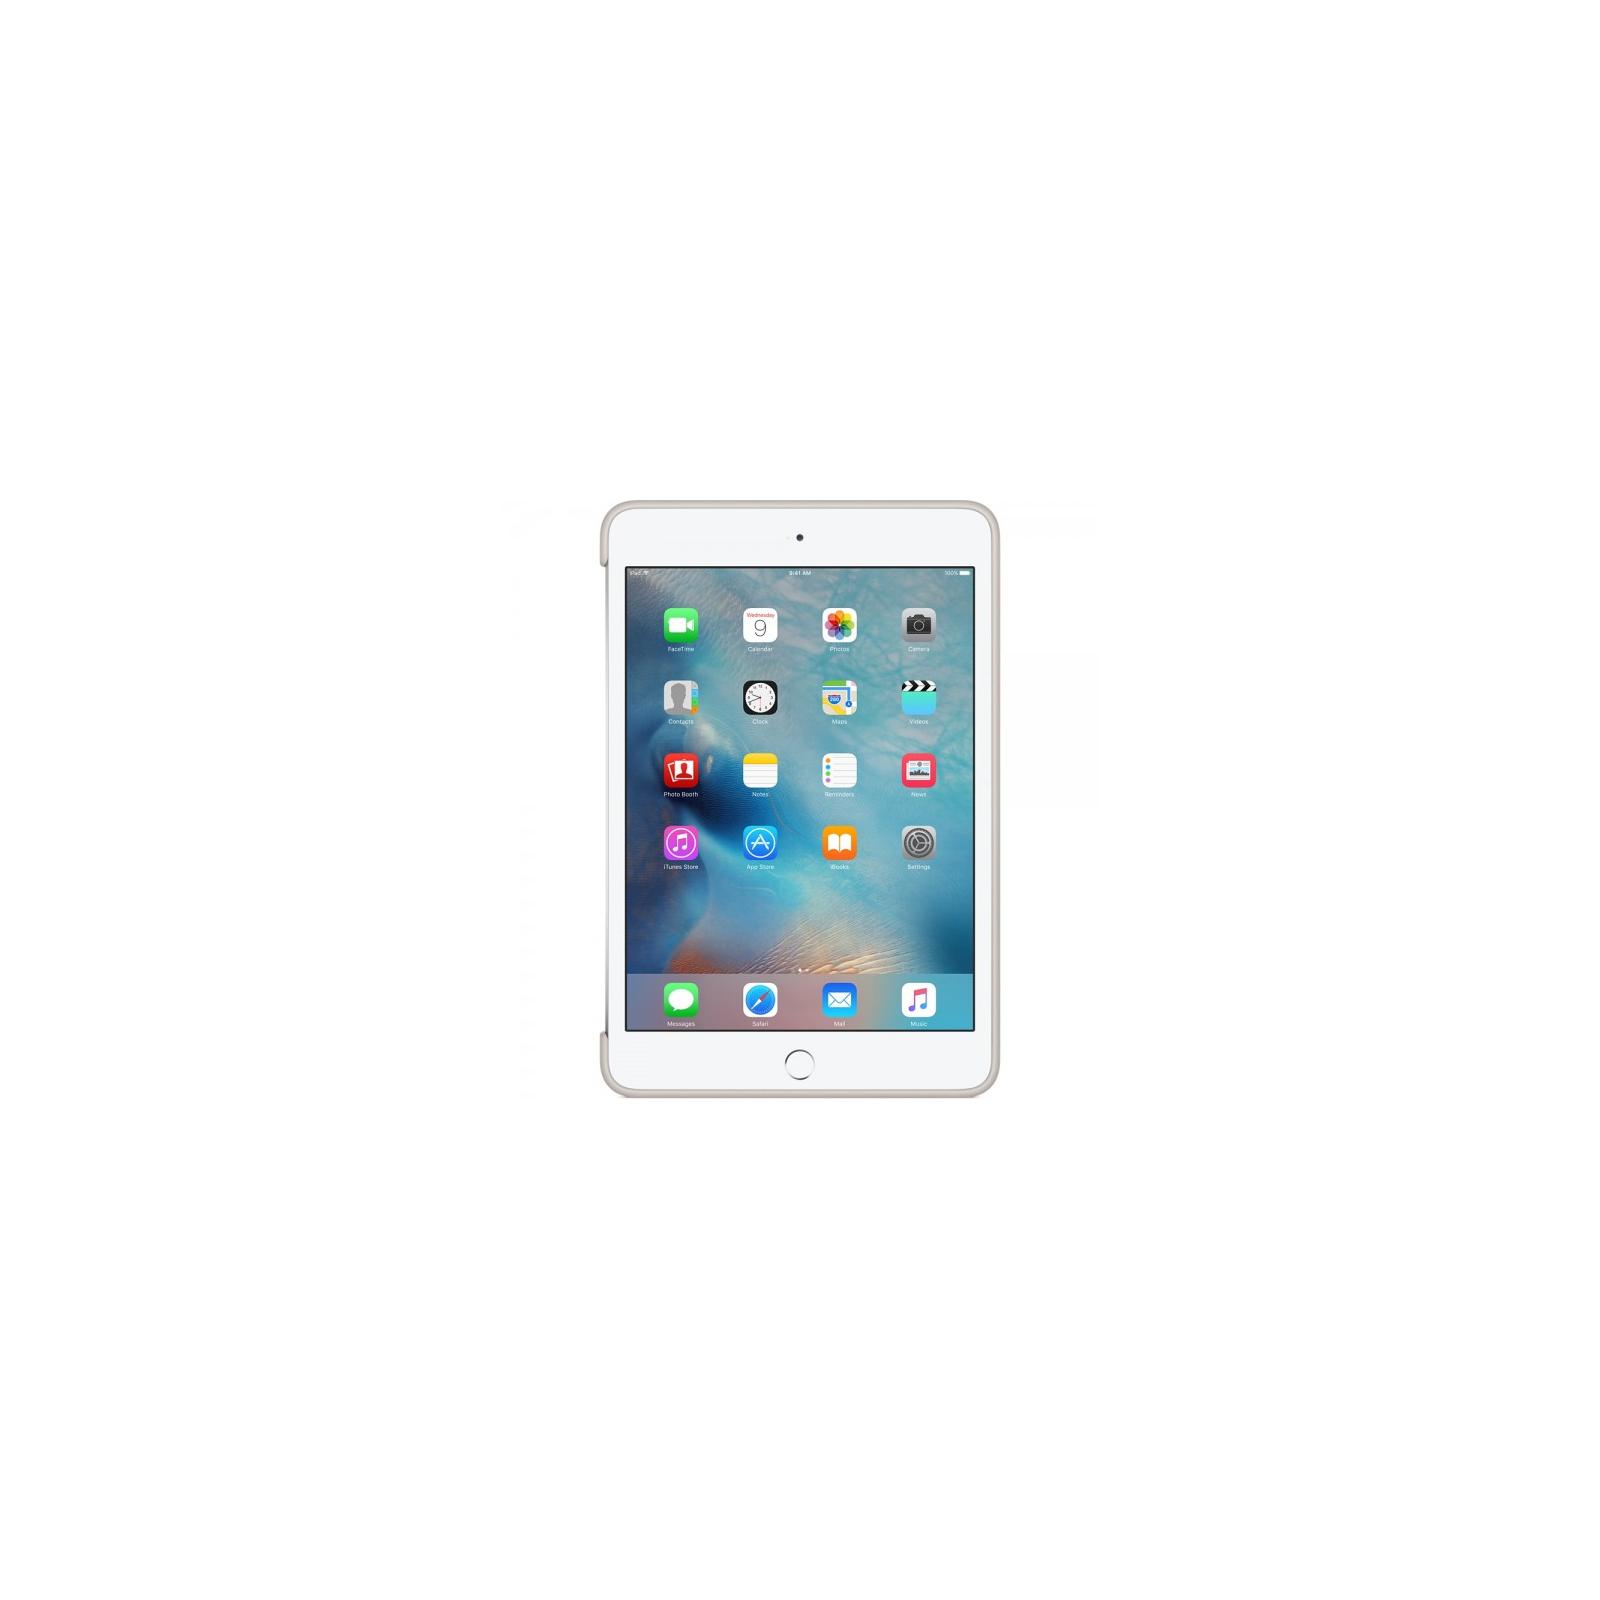 Чехол для планшета Apple iPad mini 4 Stone (MKLP2ZM/A) изображение 4